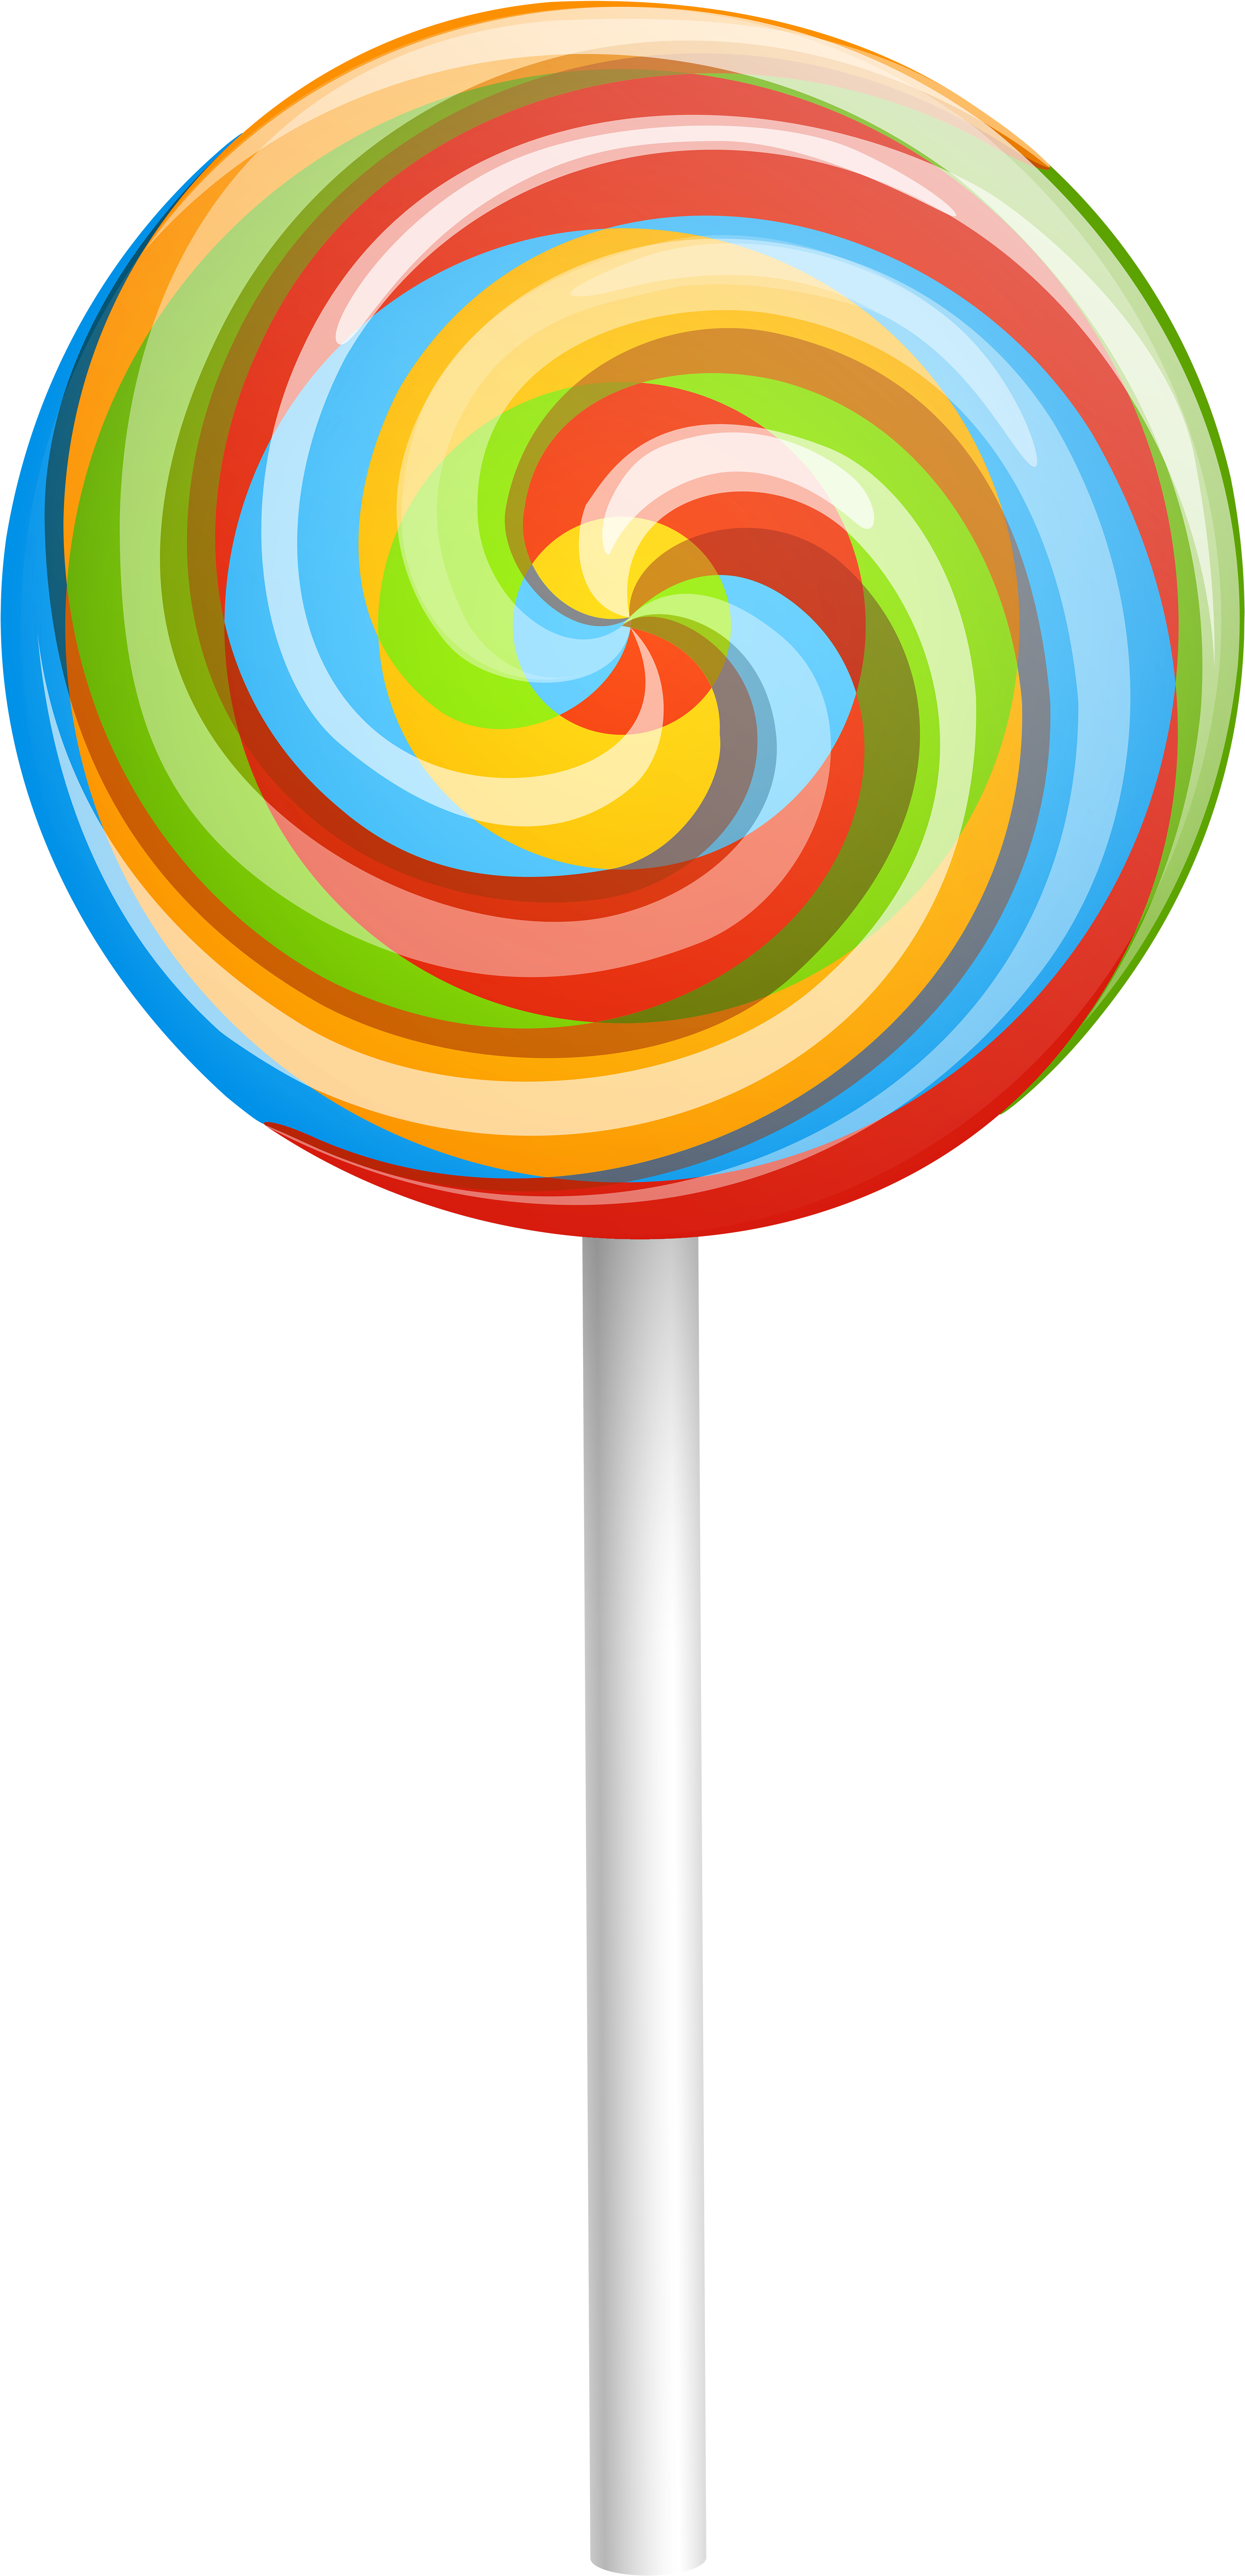 Rainbow Swirl Png Lollipop Clipart.